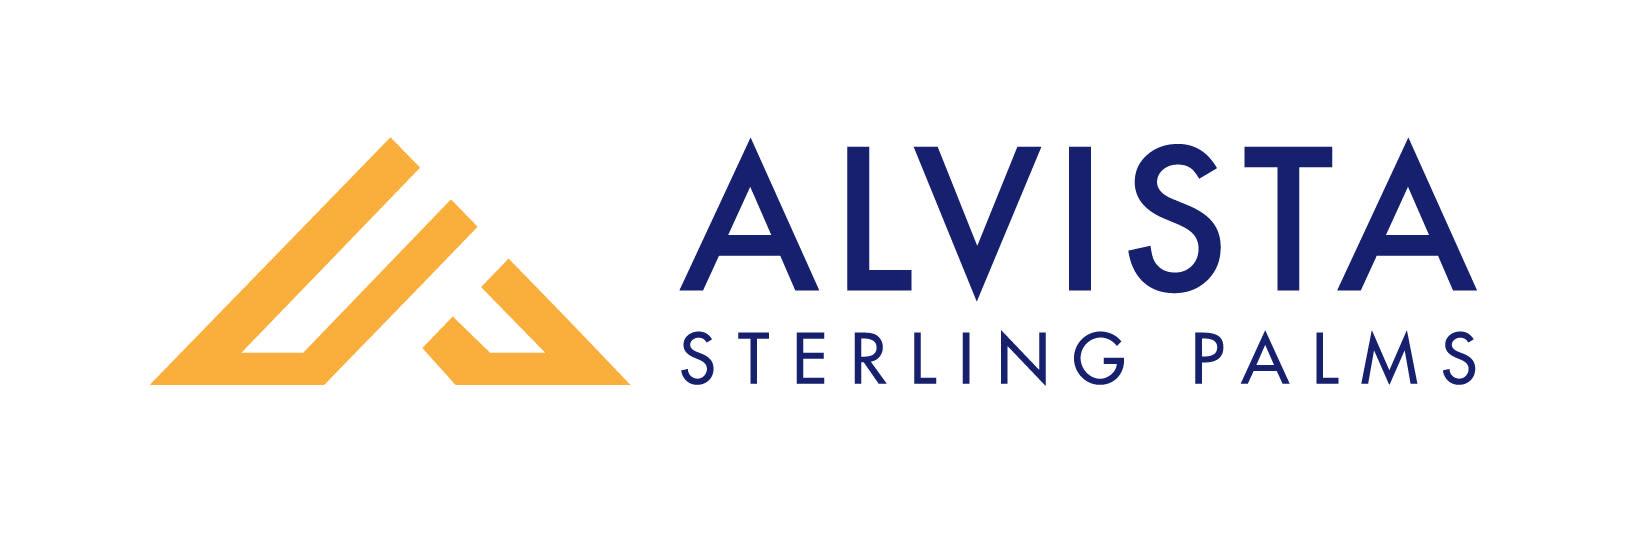 Alvista Sterling Palms